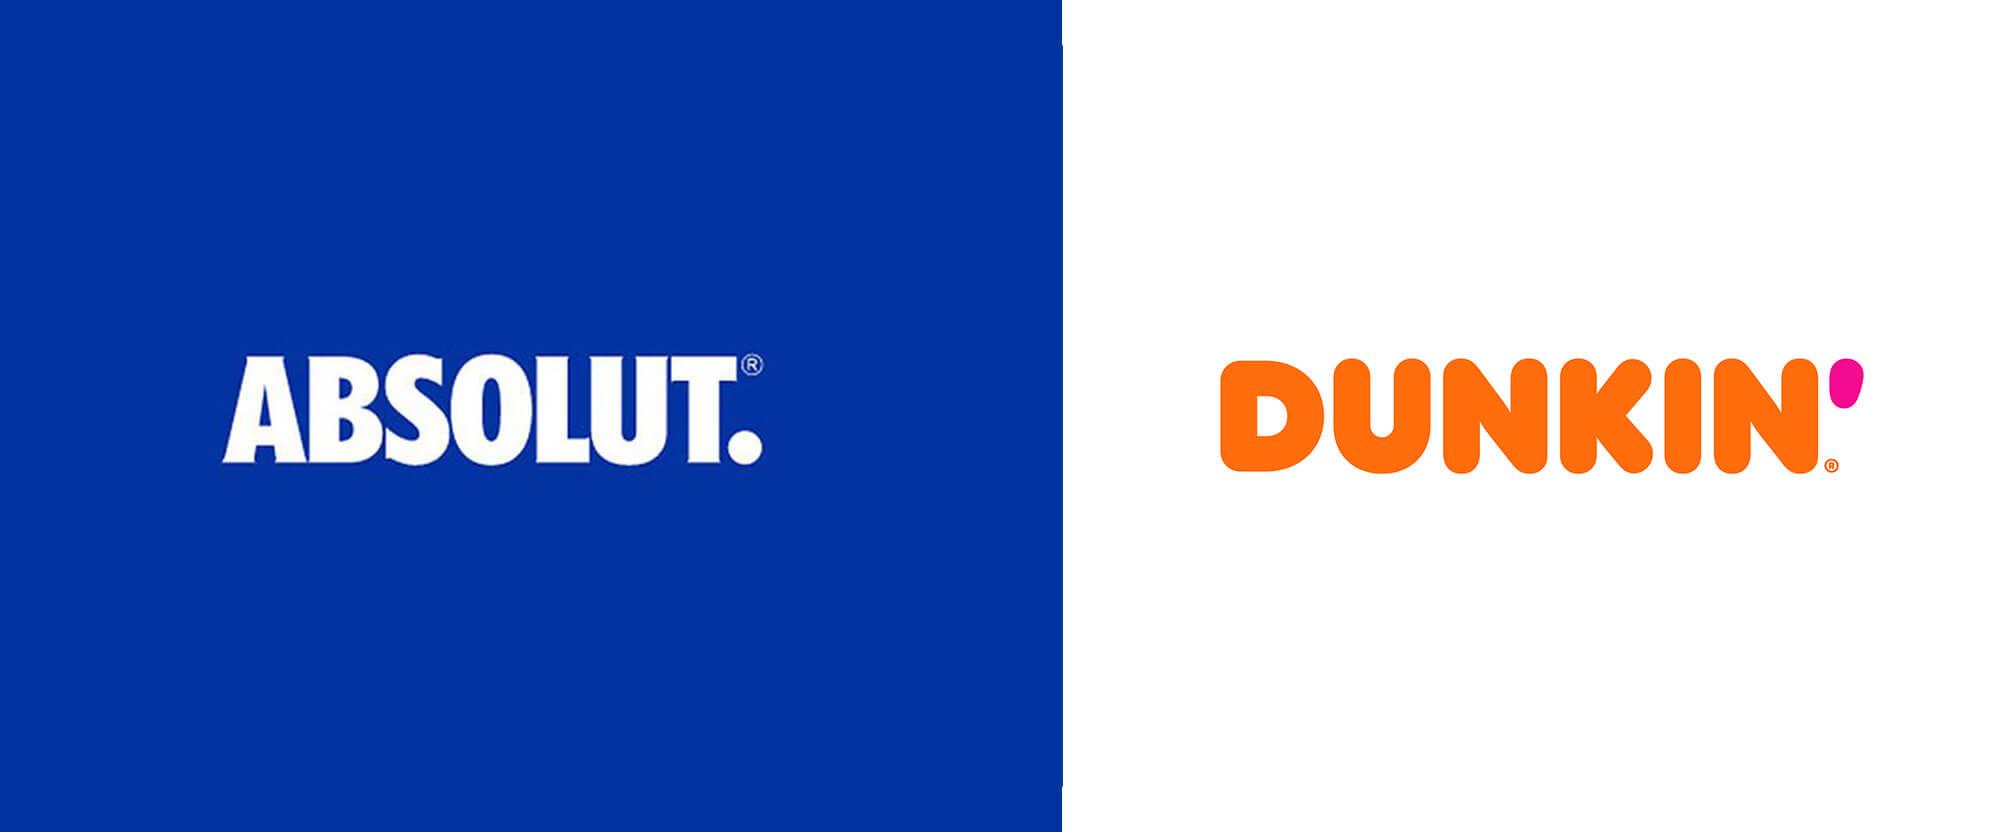 Confident and mature logo trends